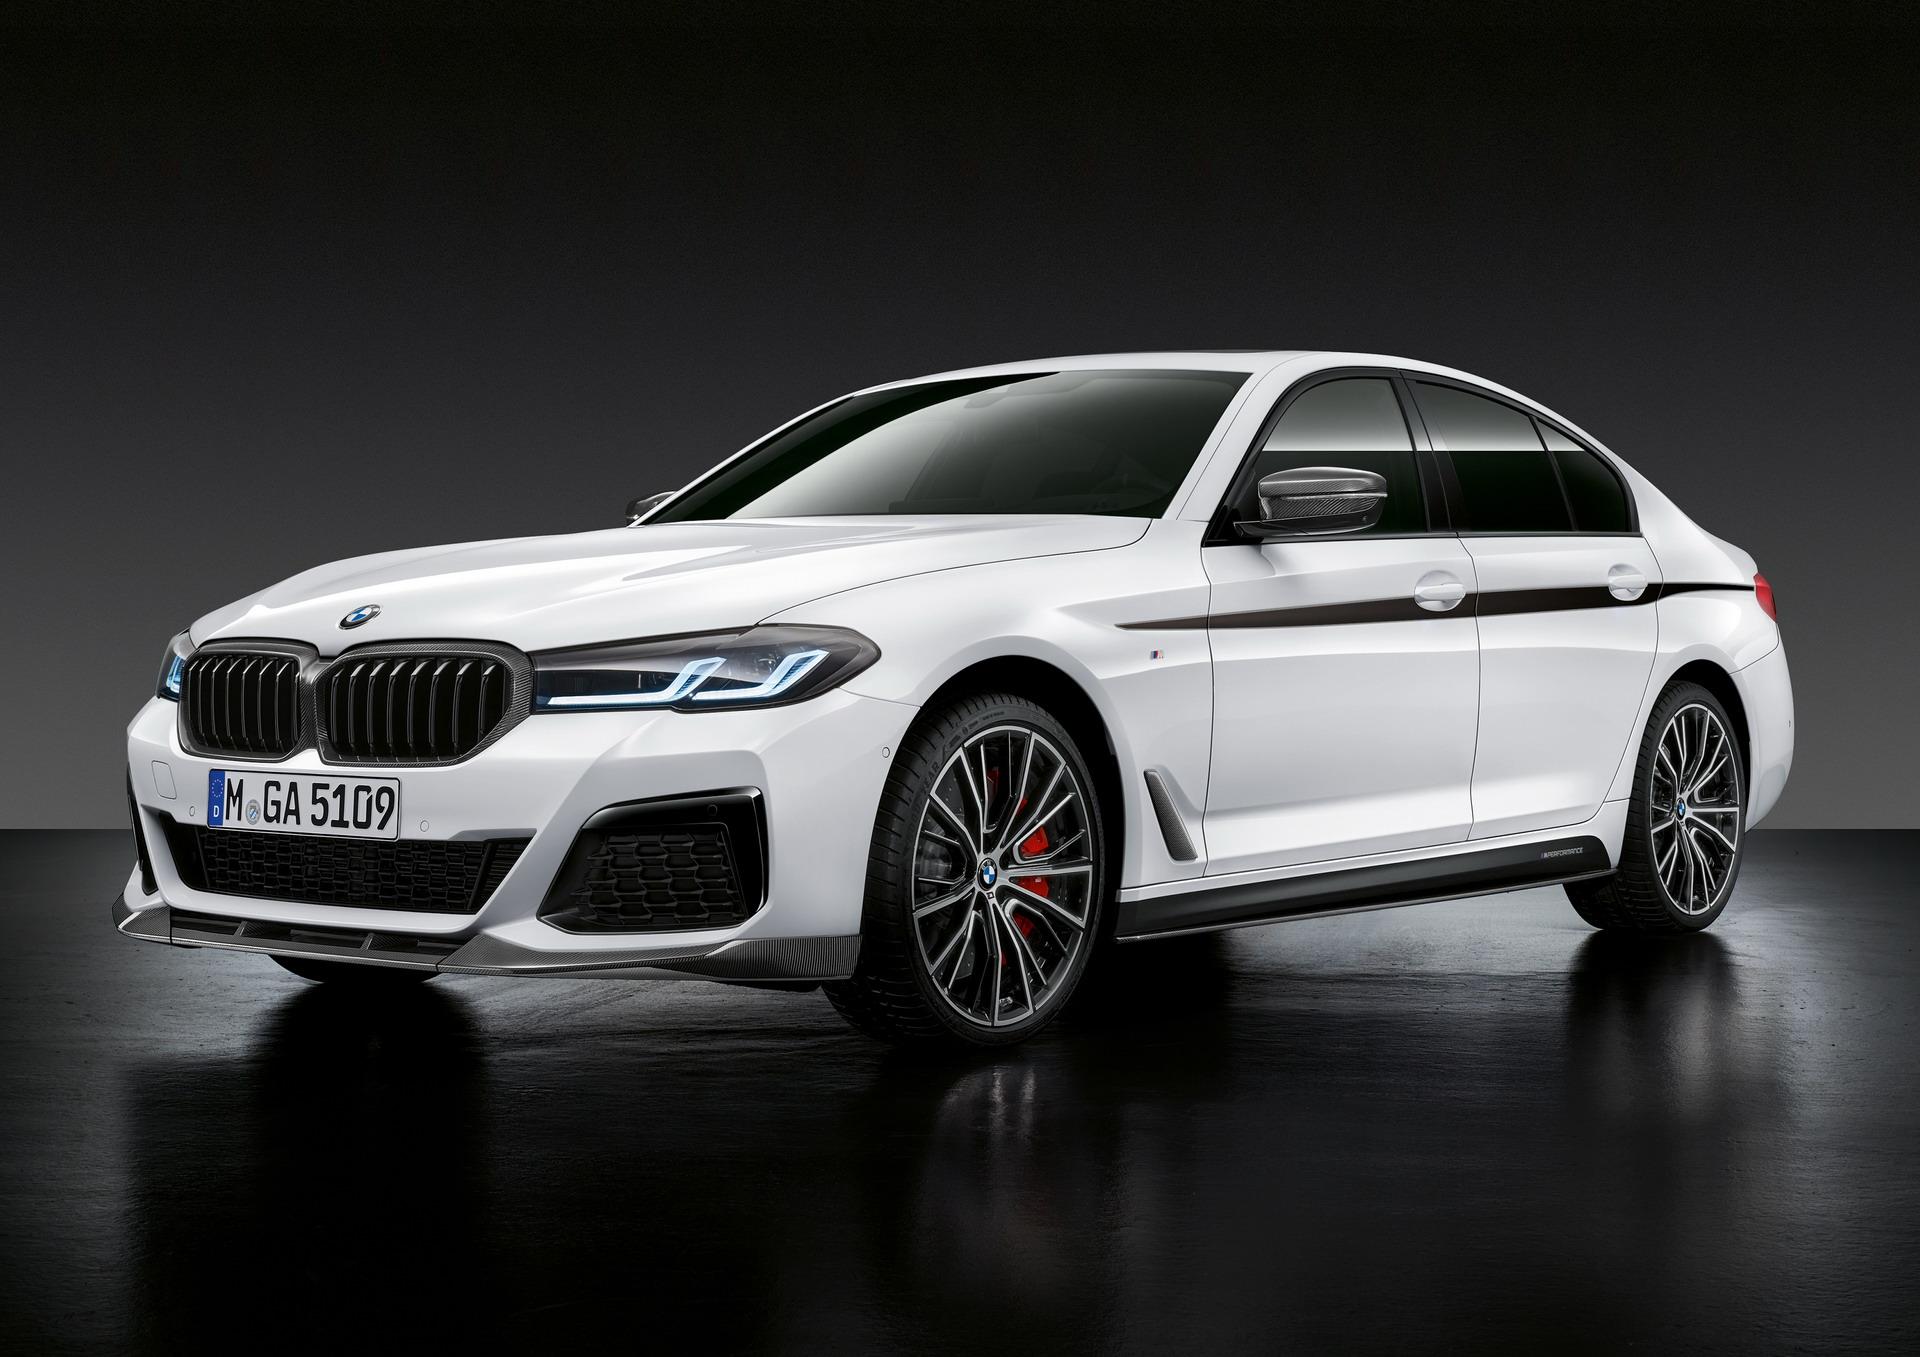 The New BMW 5 Series LCI M Performance Parts 2